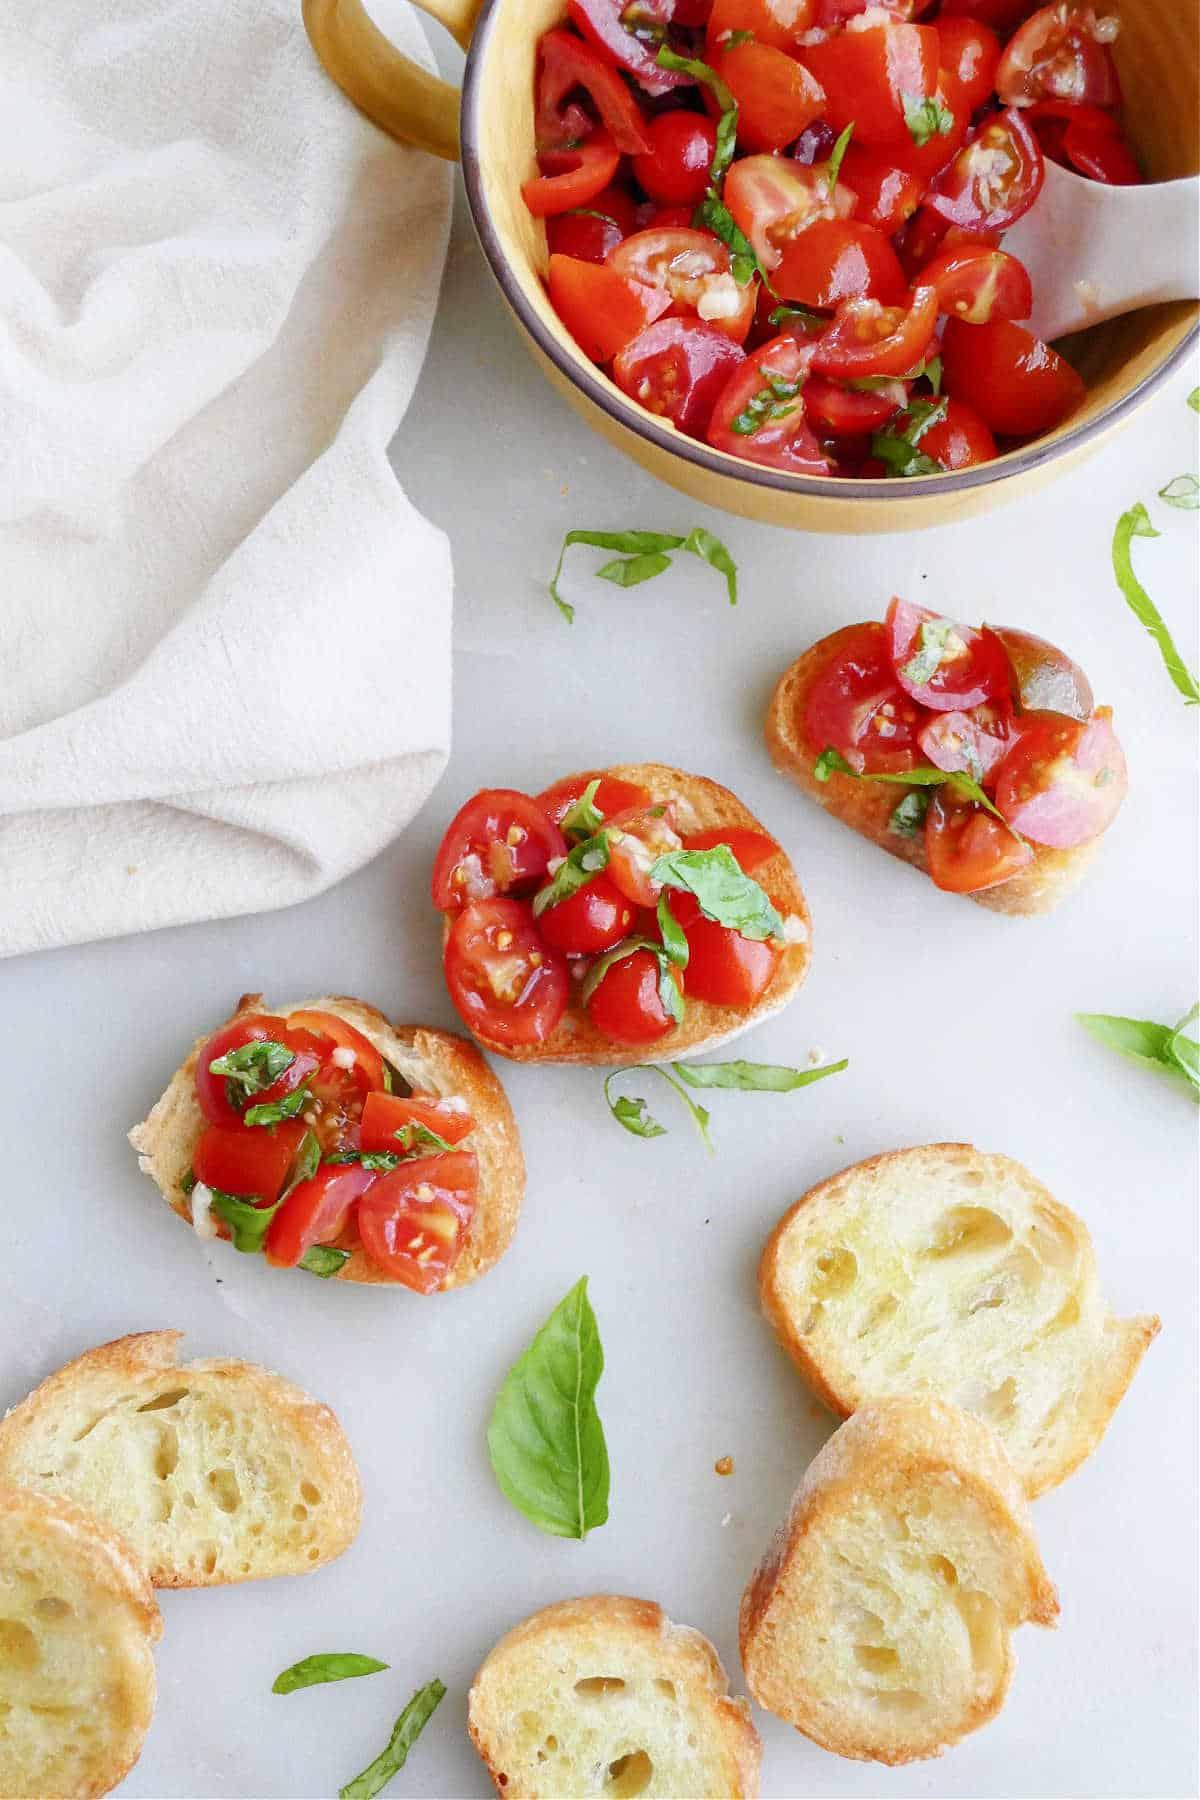 three cherry tomato bruschetta slices next to plain bread slices and topping